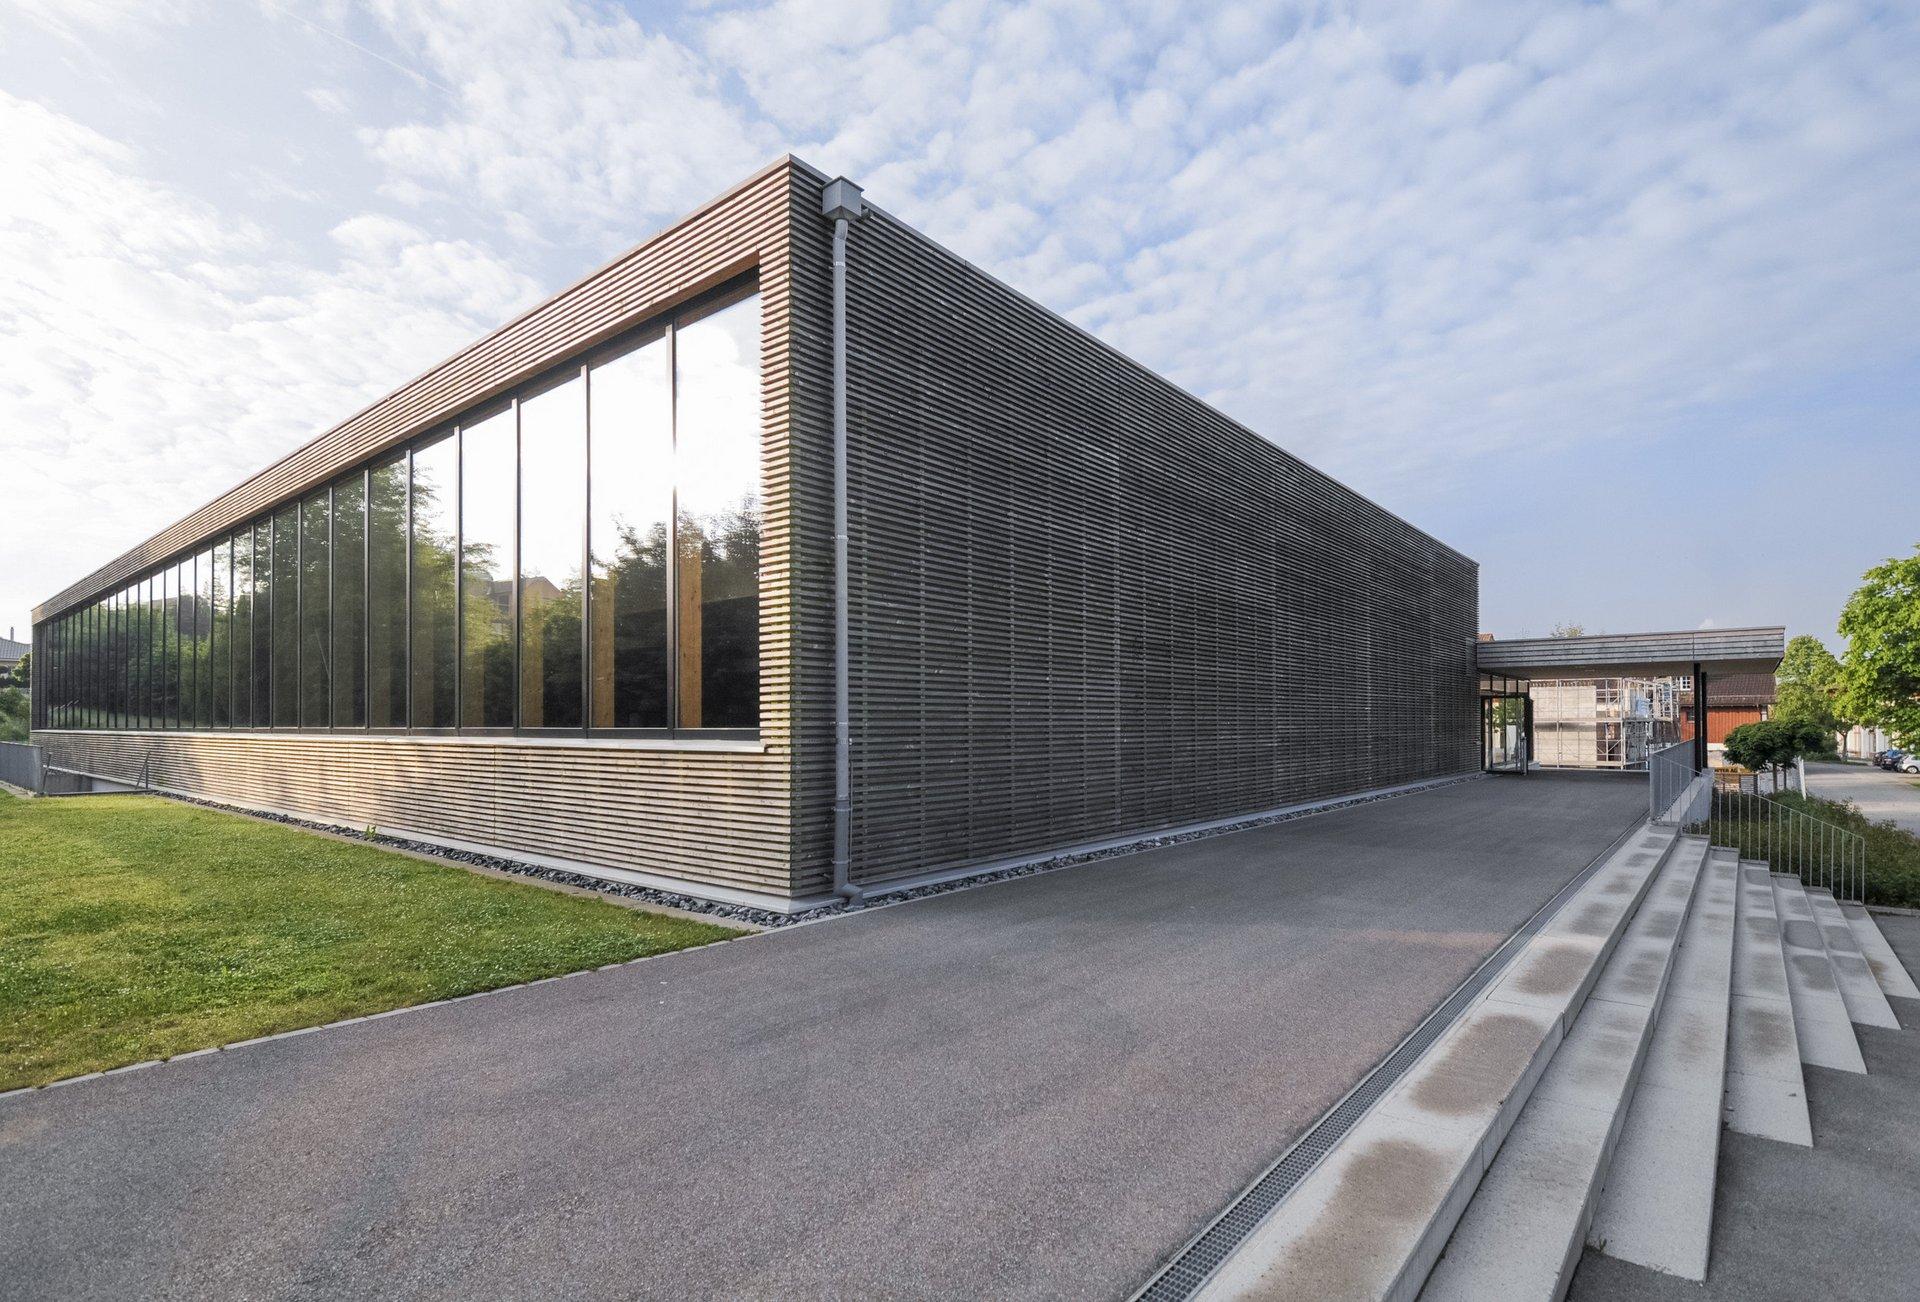 Sporthalle mit Fassade aus Holzlamellen quer